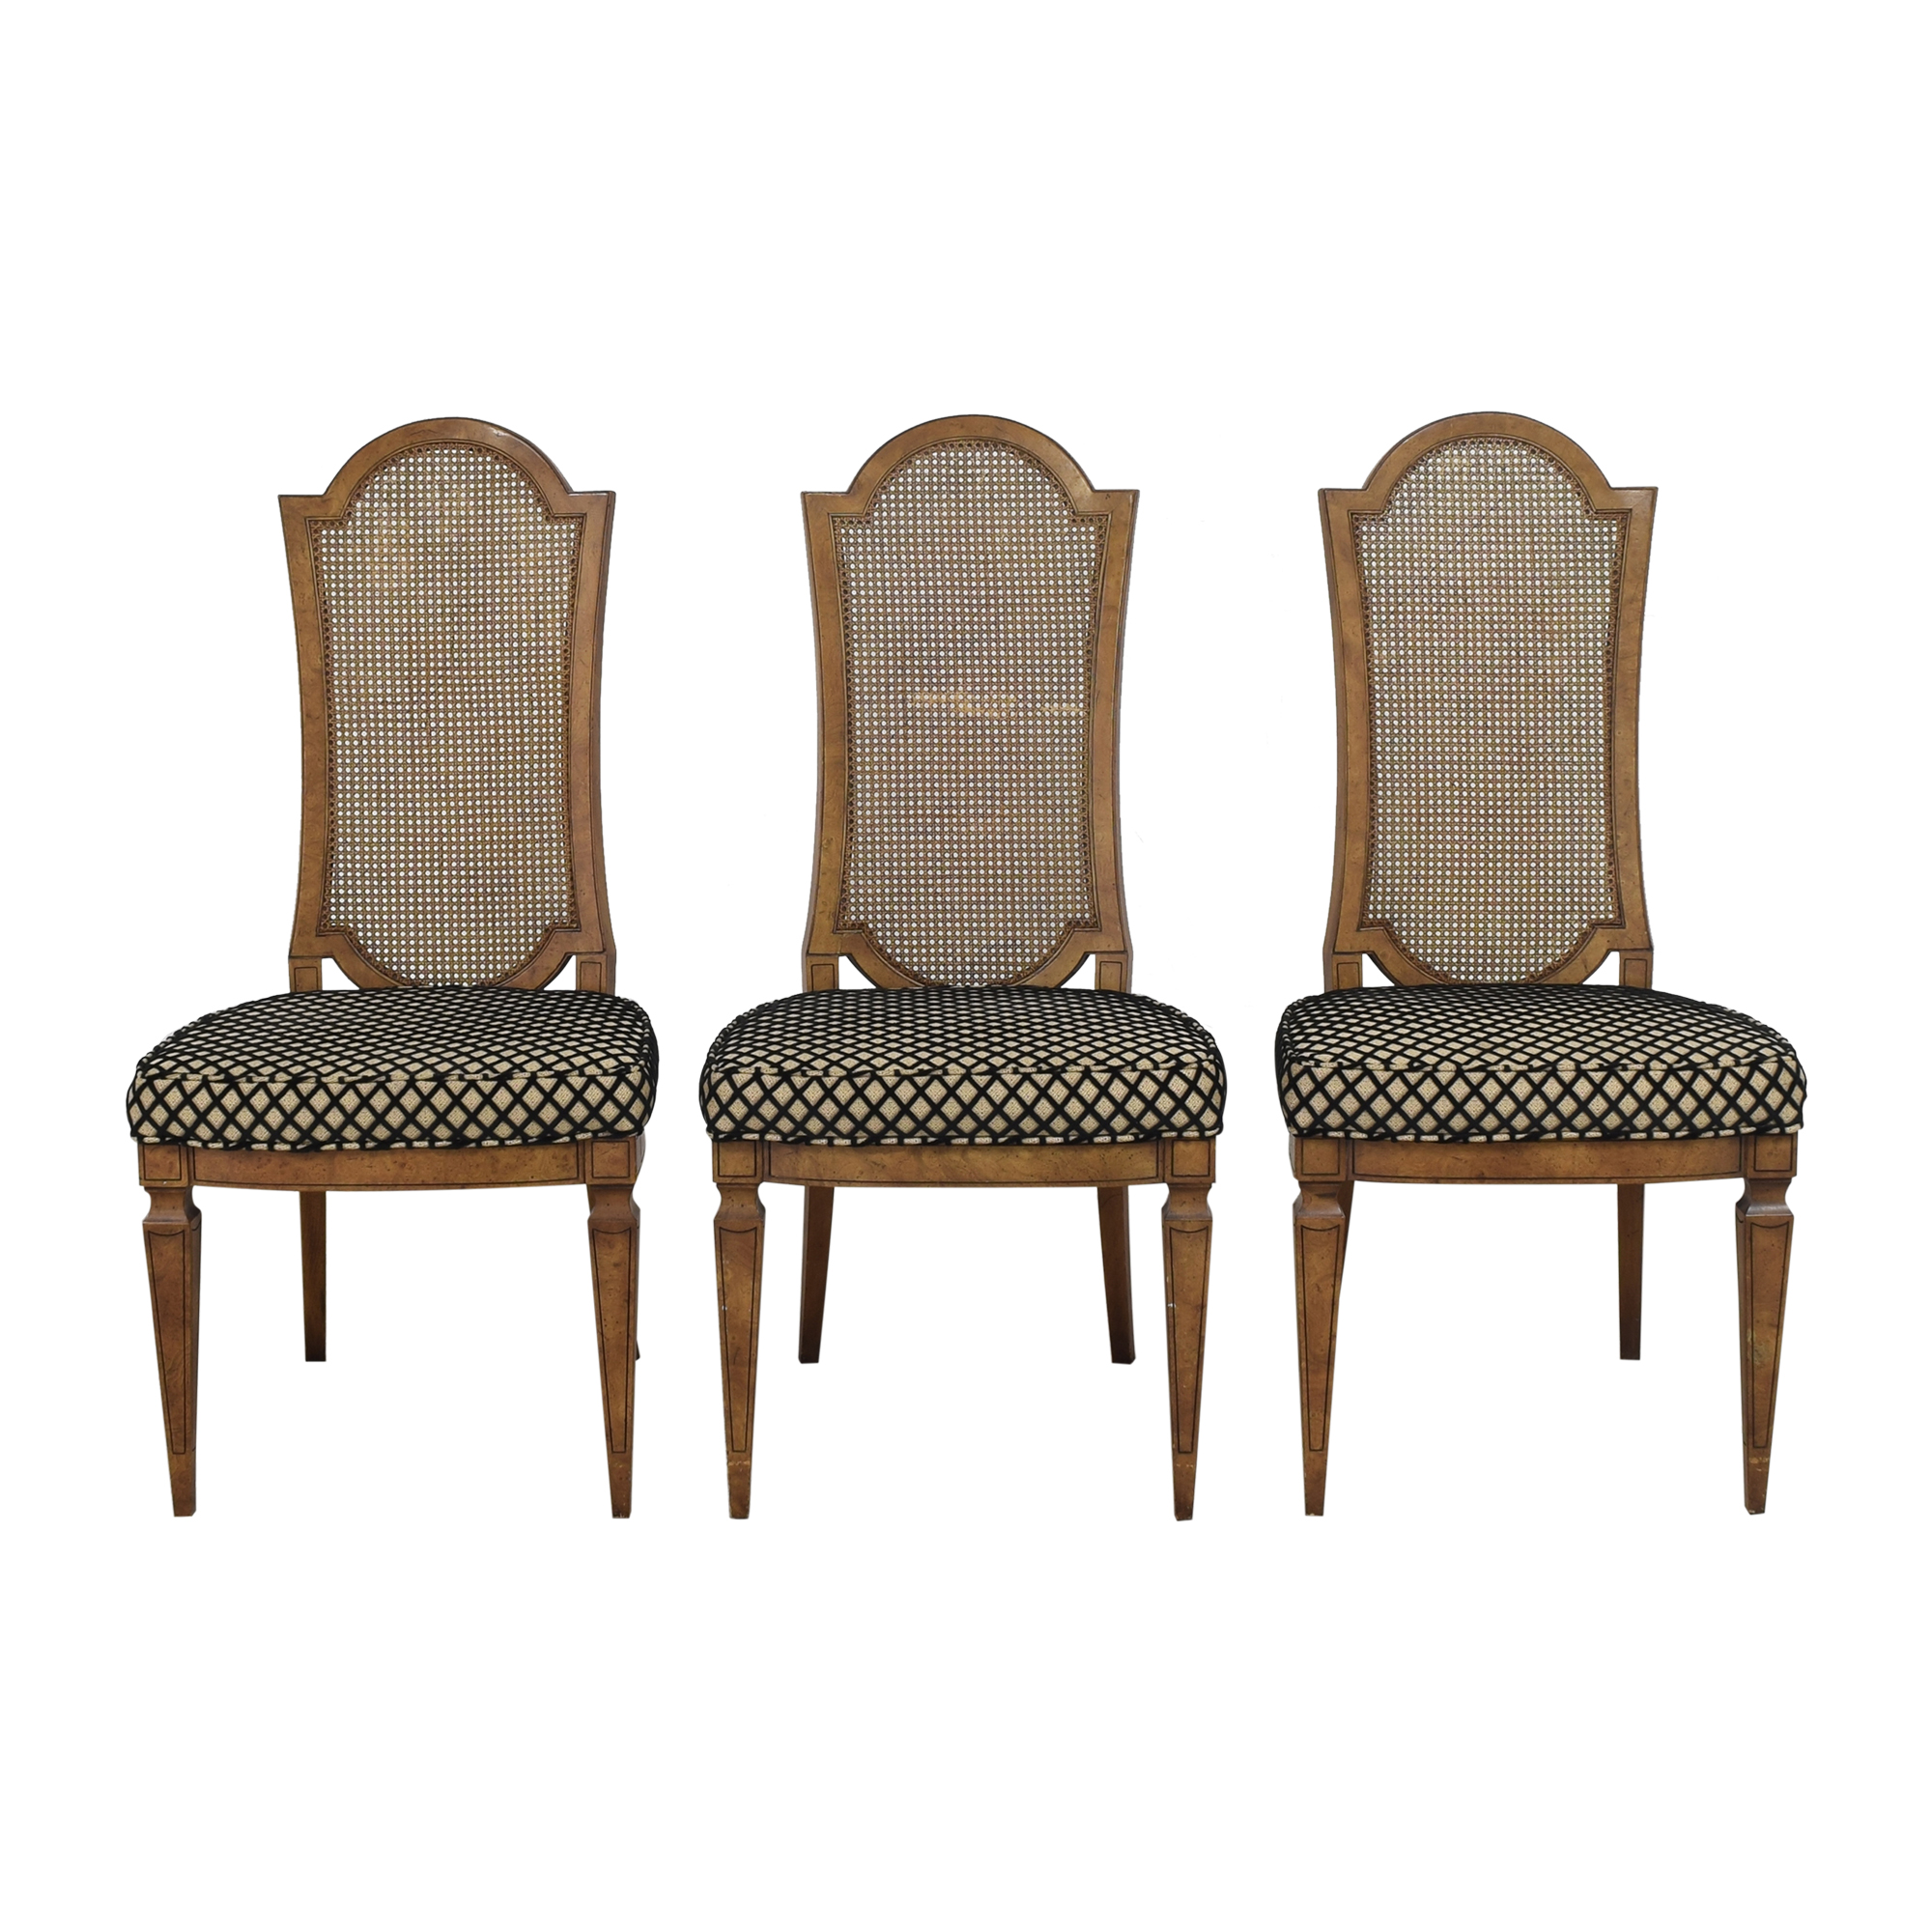 Mastercraft Furniture Mastercraft High Back Dining Chairs second hand